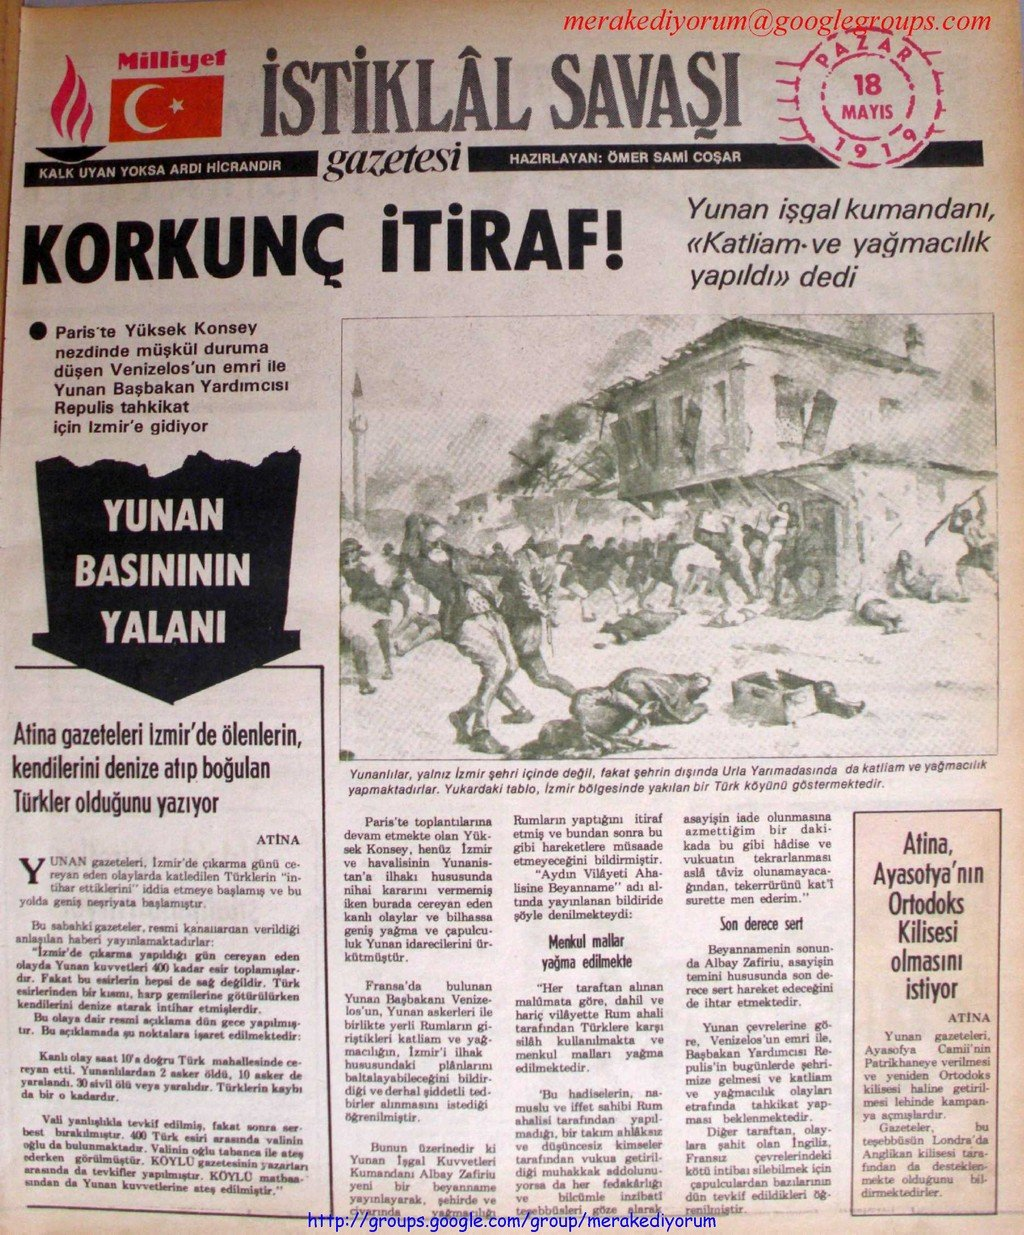 istiklal savaşı gazetesi - 18 mayıs 1919